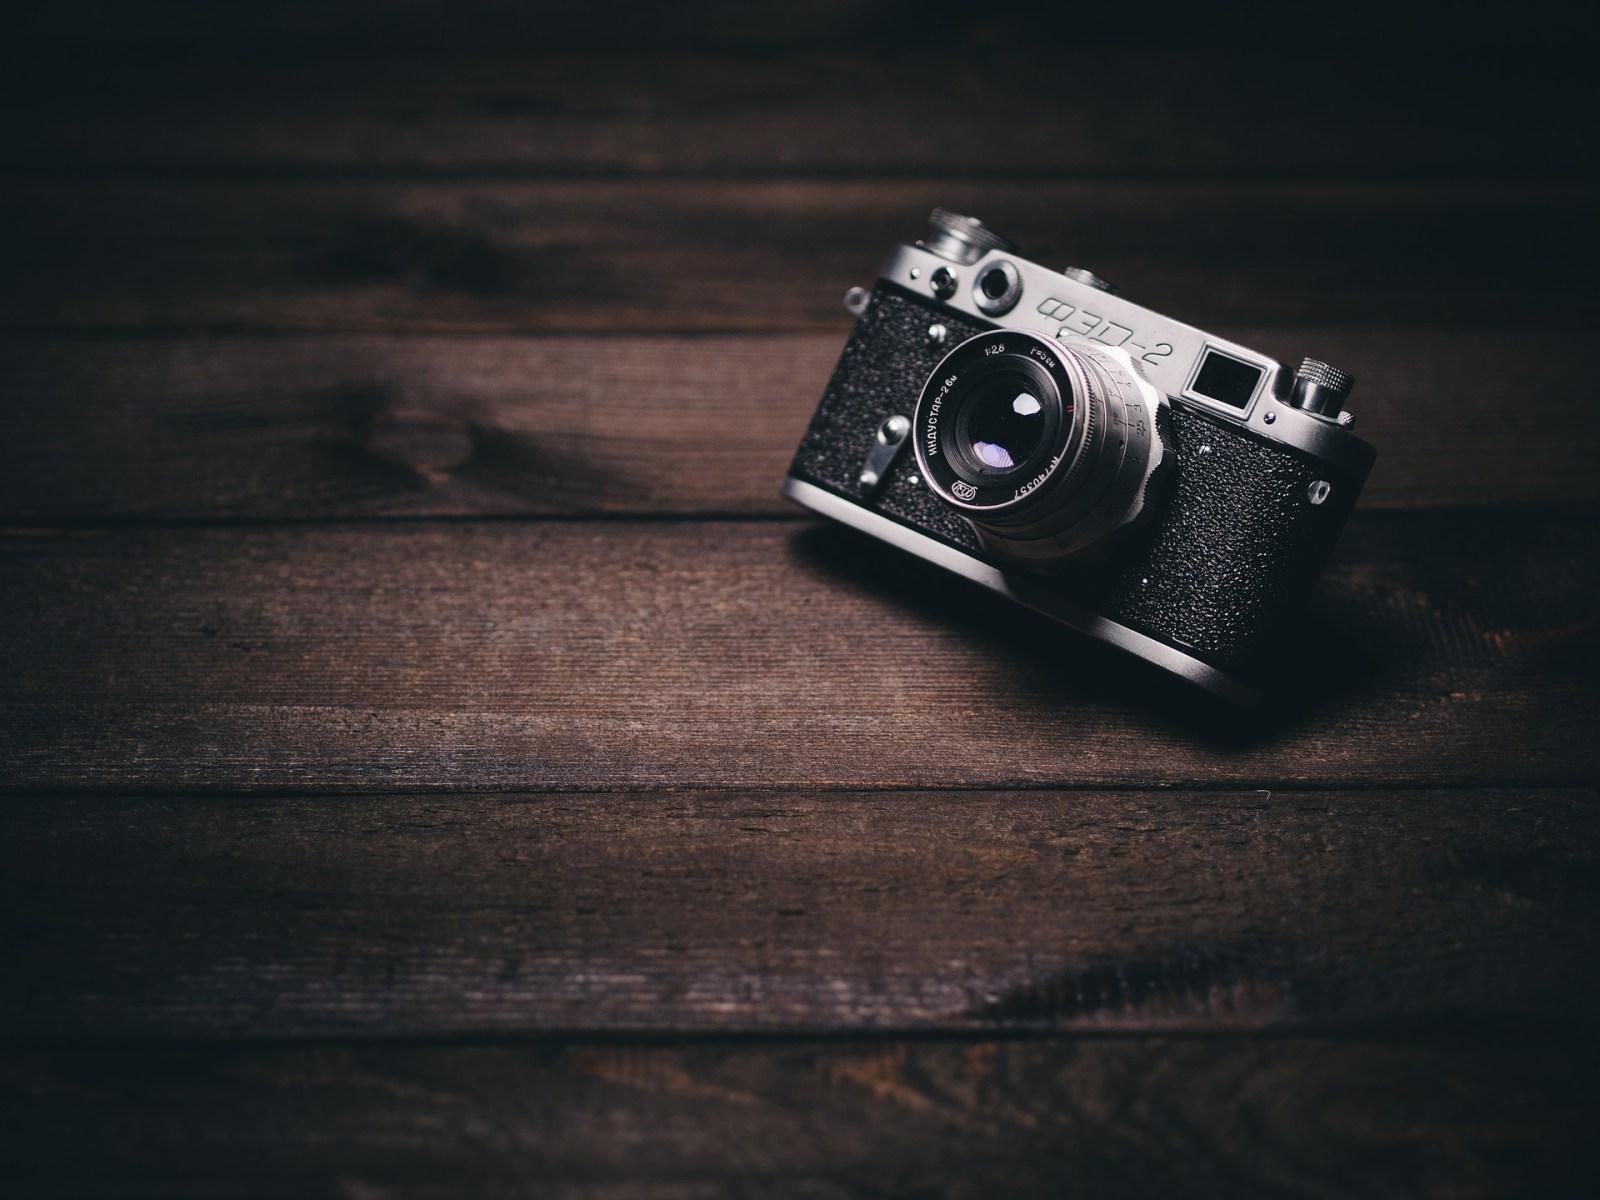 Vlogging cameras under $100